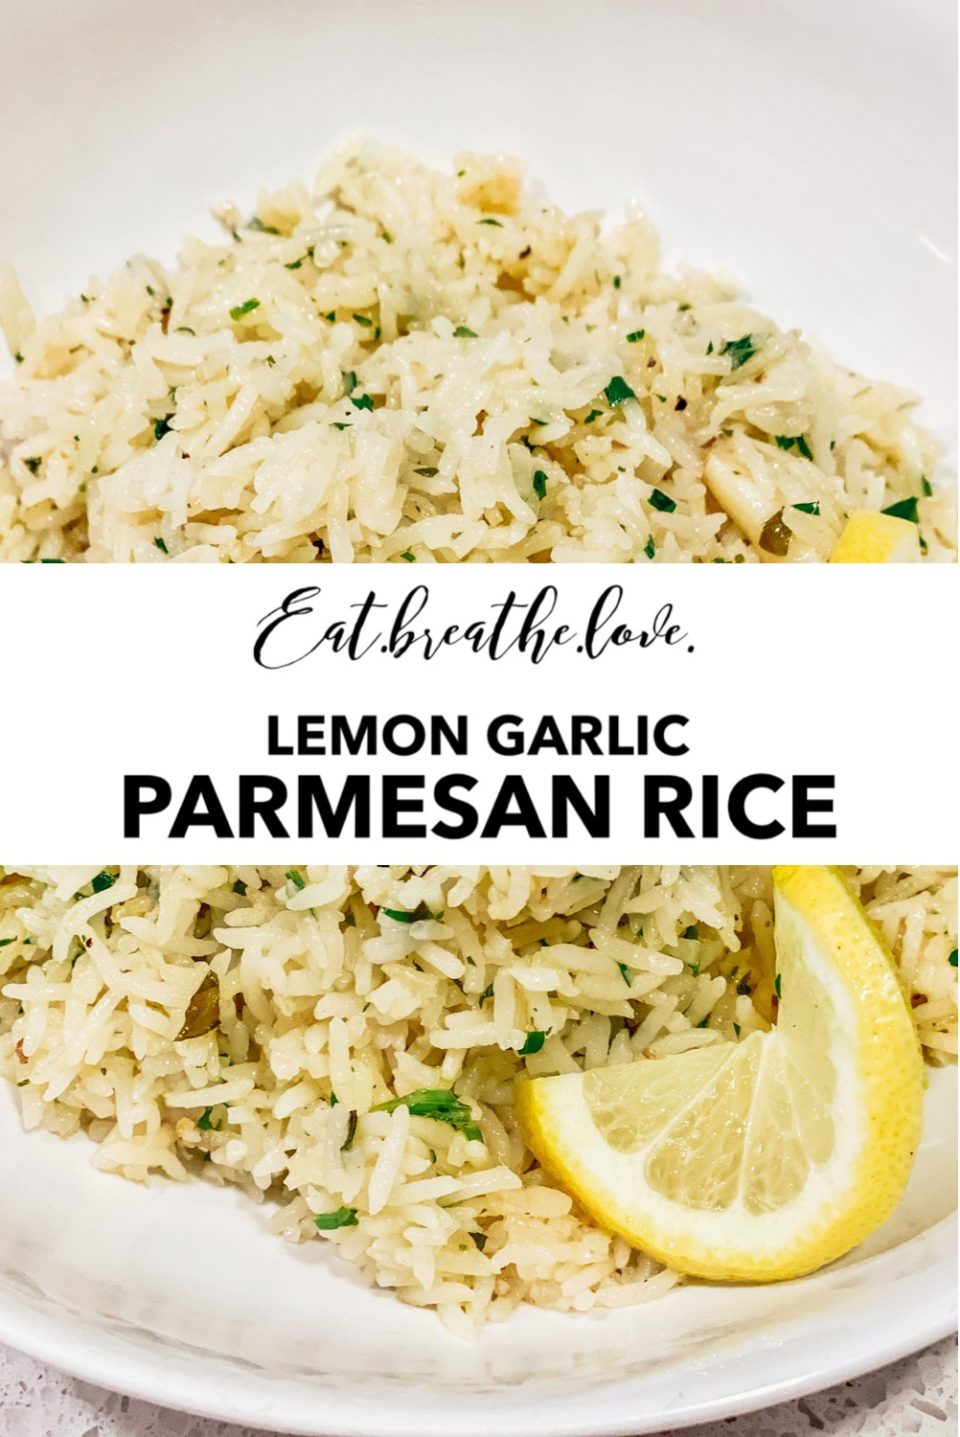 Easy Lemon Garlic Parmesan Rice || www.eatbreathelove.net